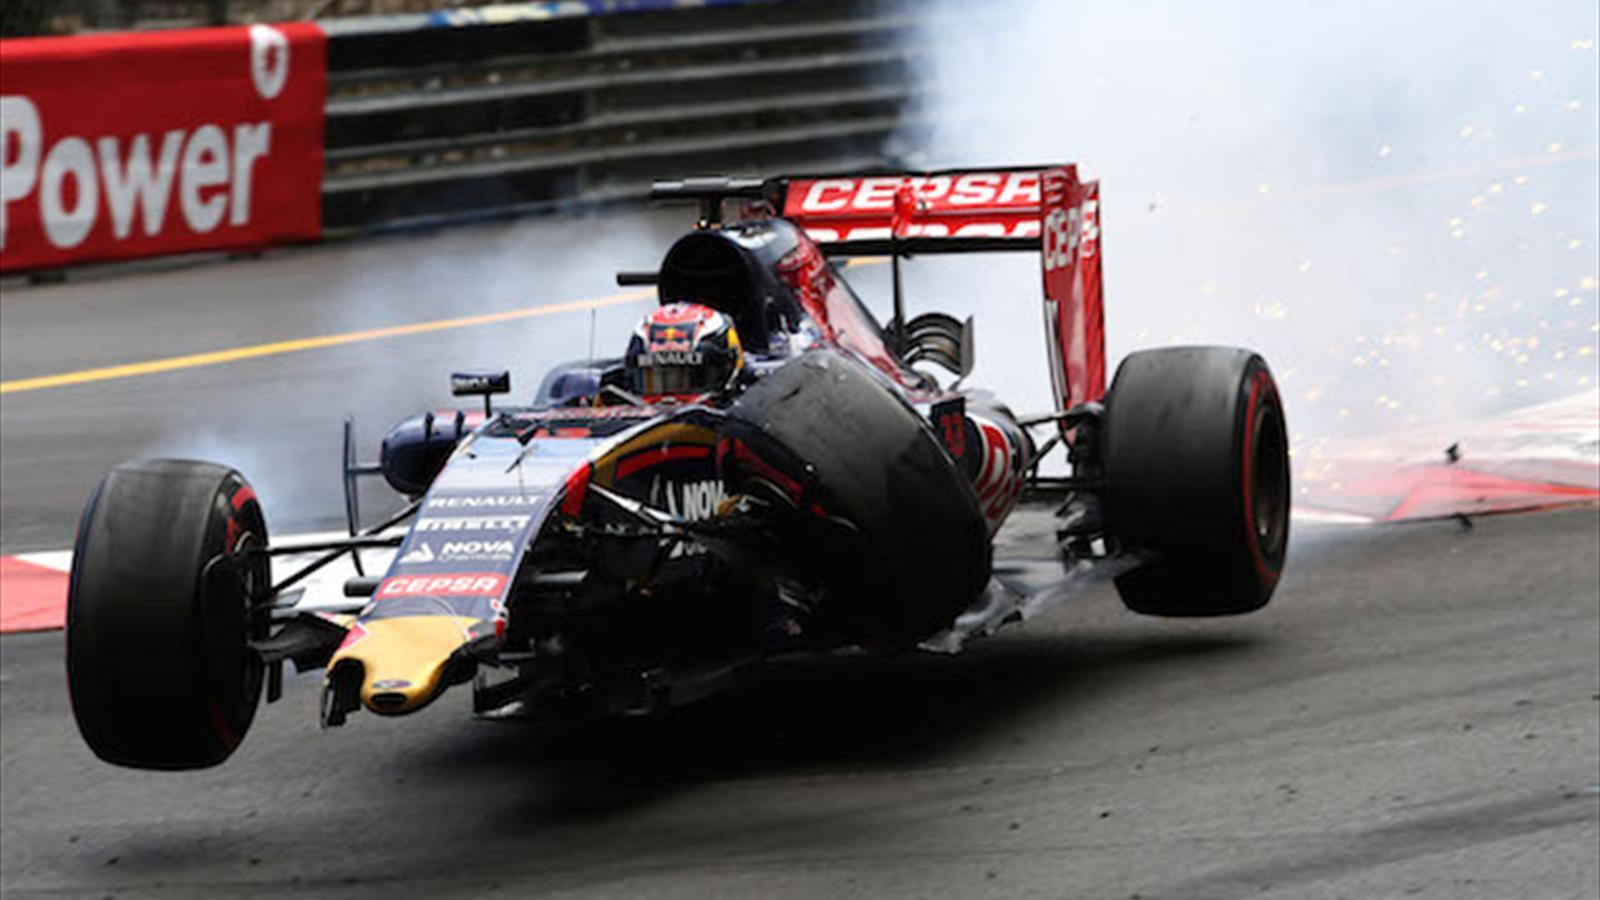 Felipe Massa: Max Verstappen crash due to lack of experience - Formula 1 - Eurosport